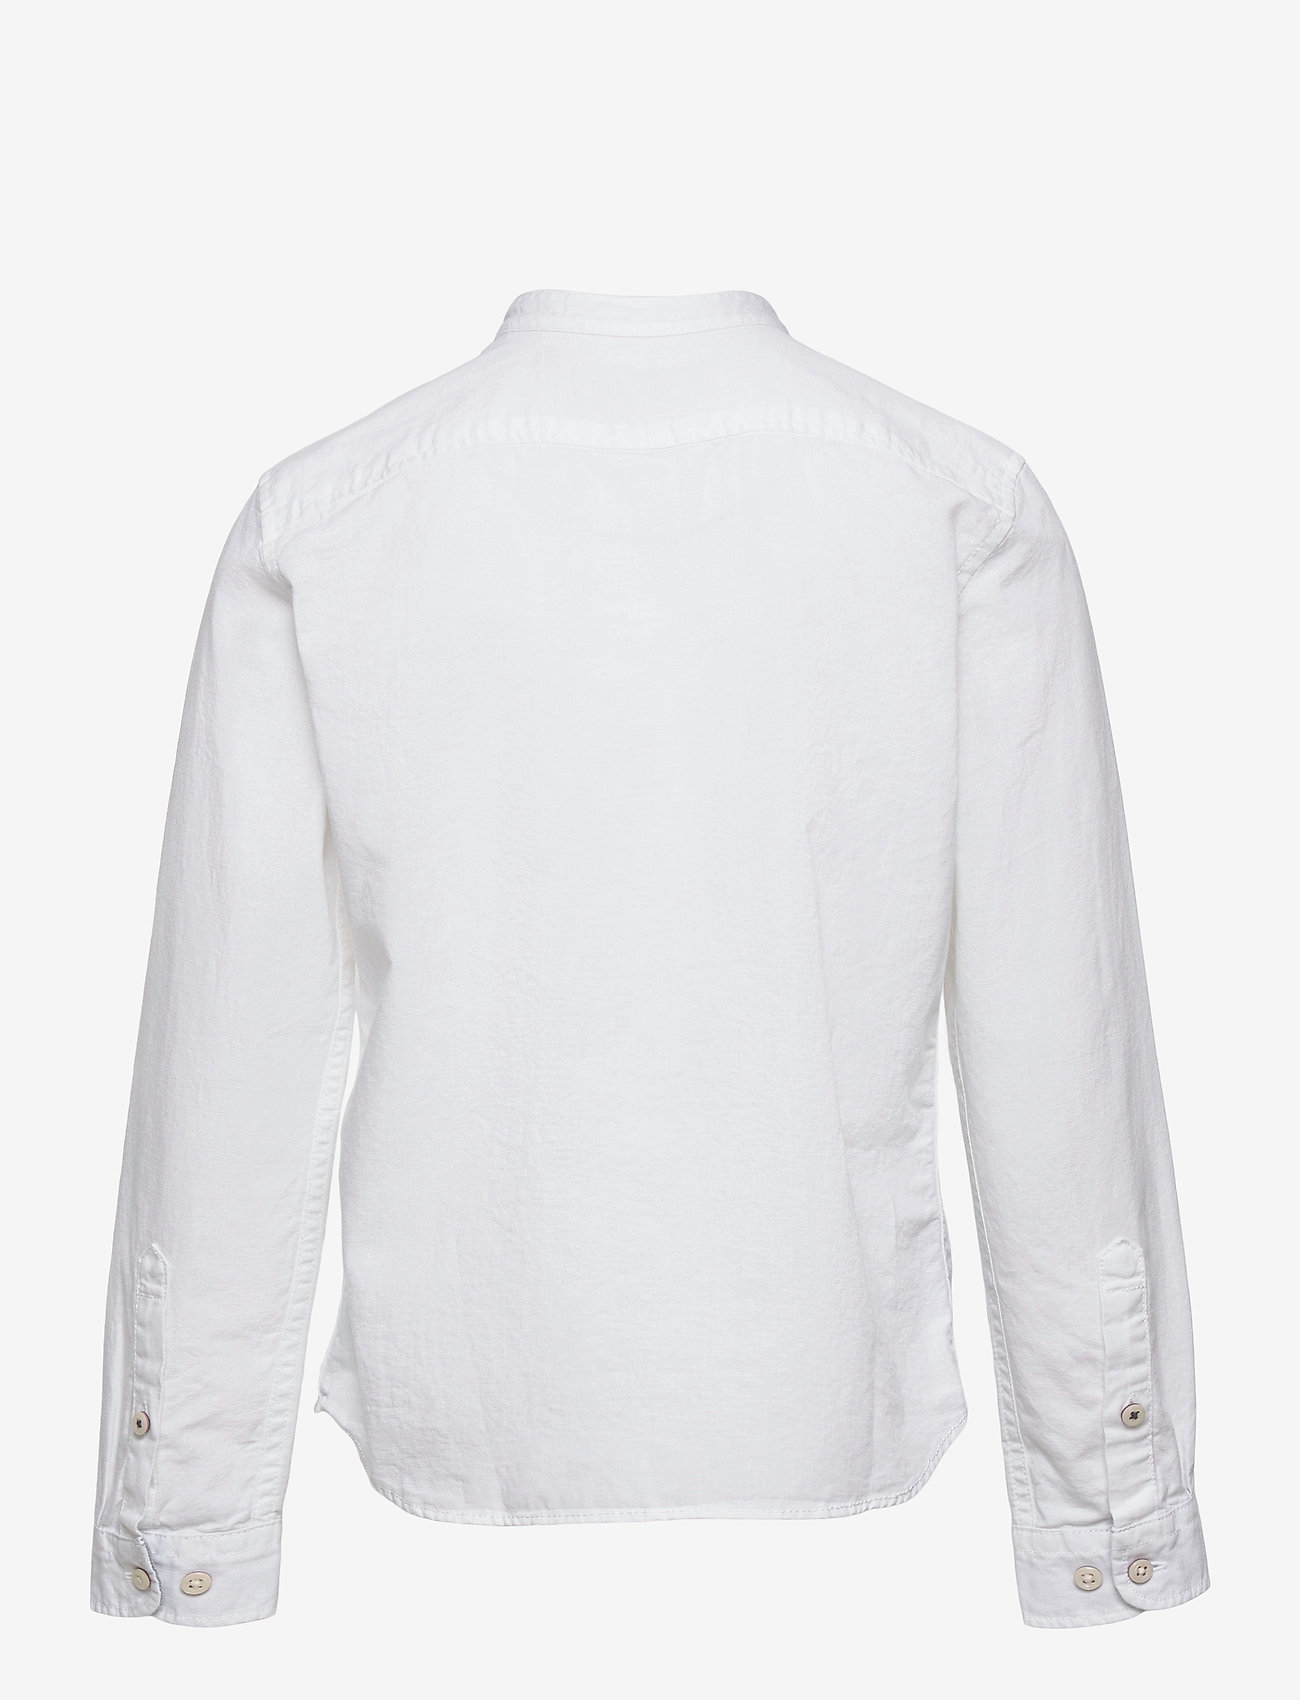 Jack & Jones - JJEBAND SUMMER SHIRT L/S JR - shirts - white - 1